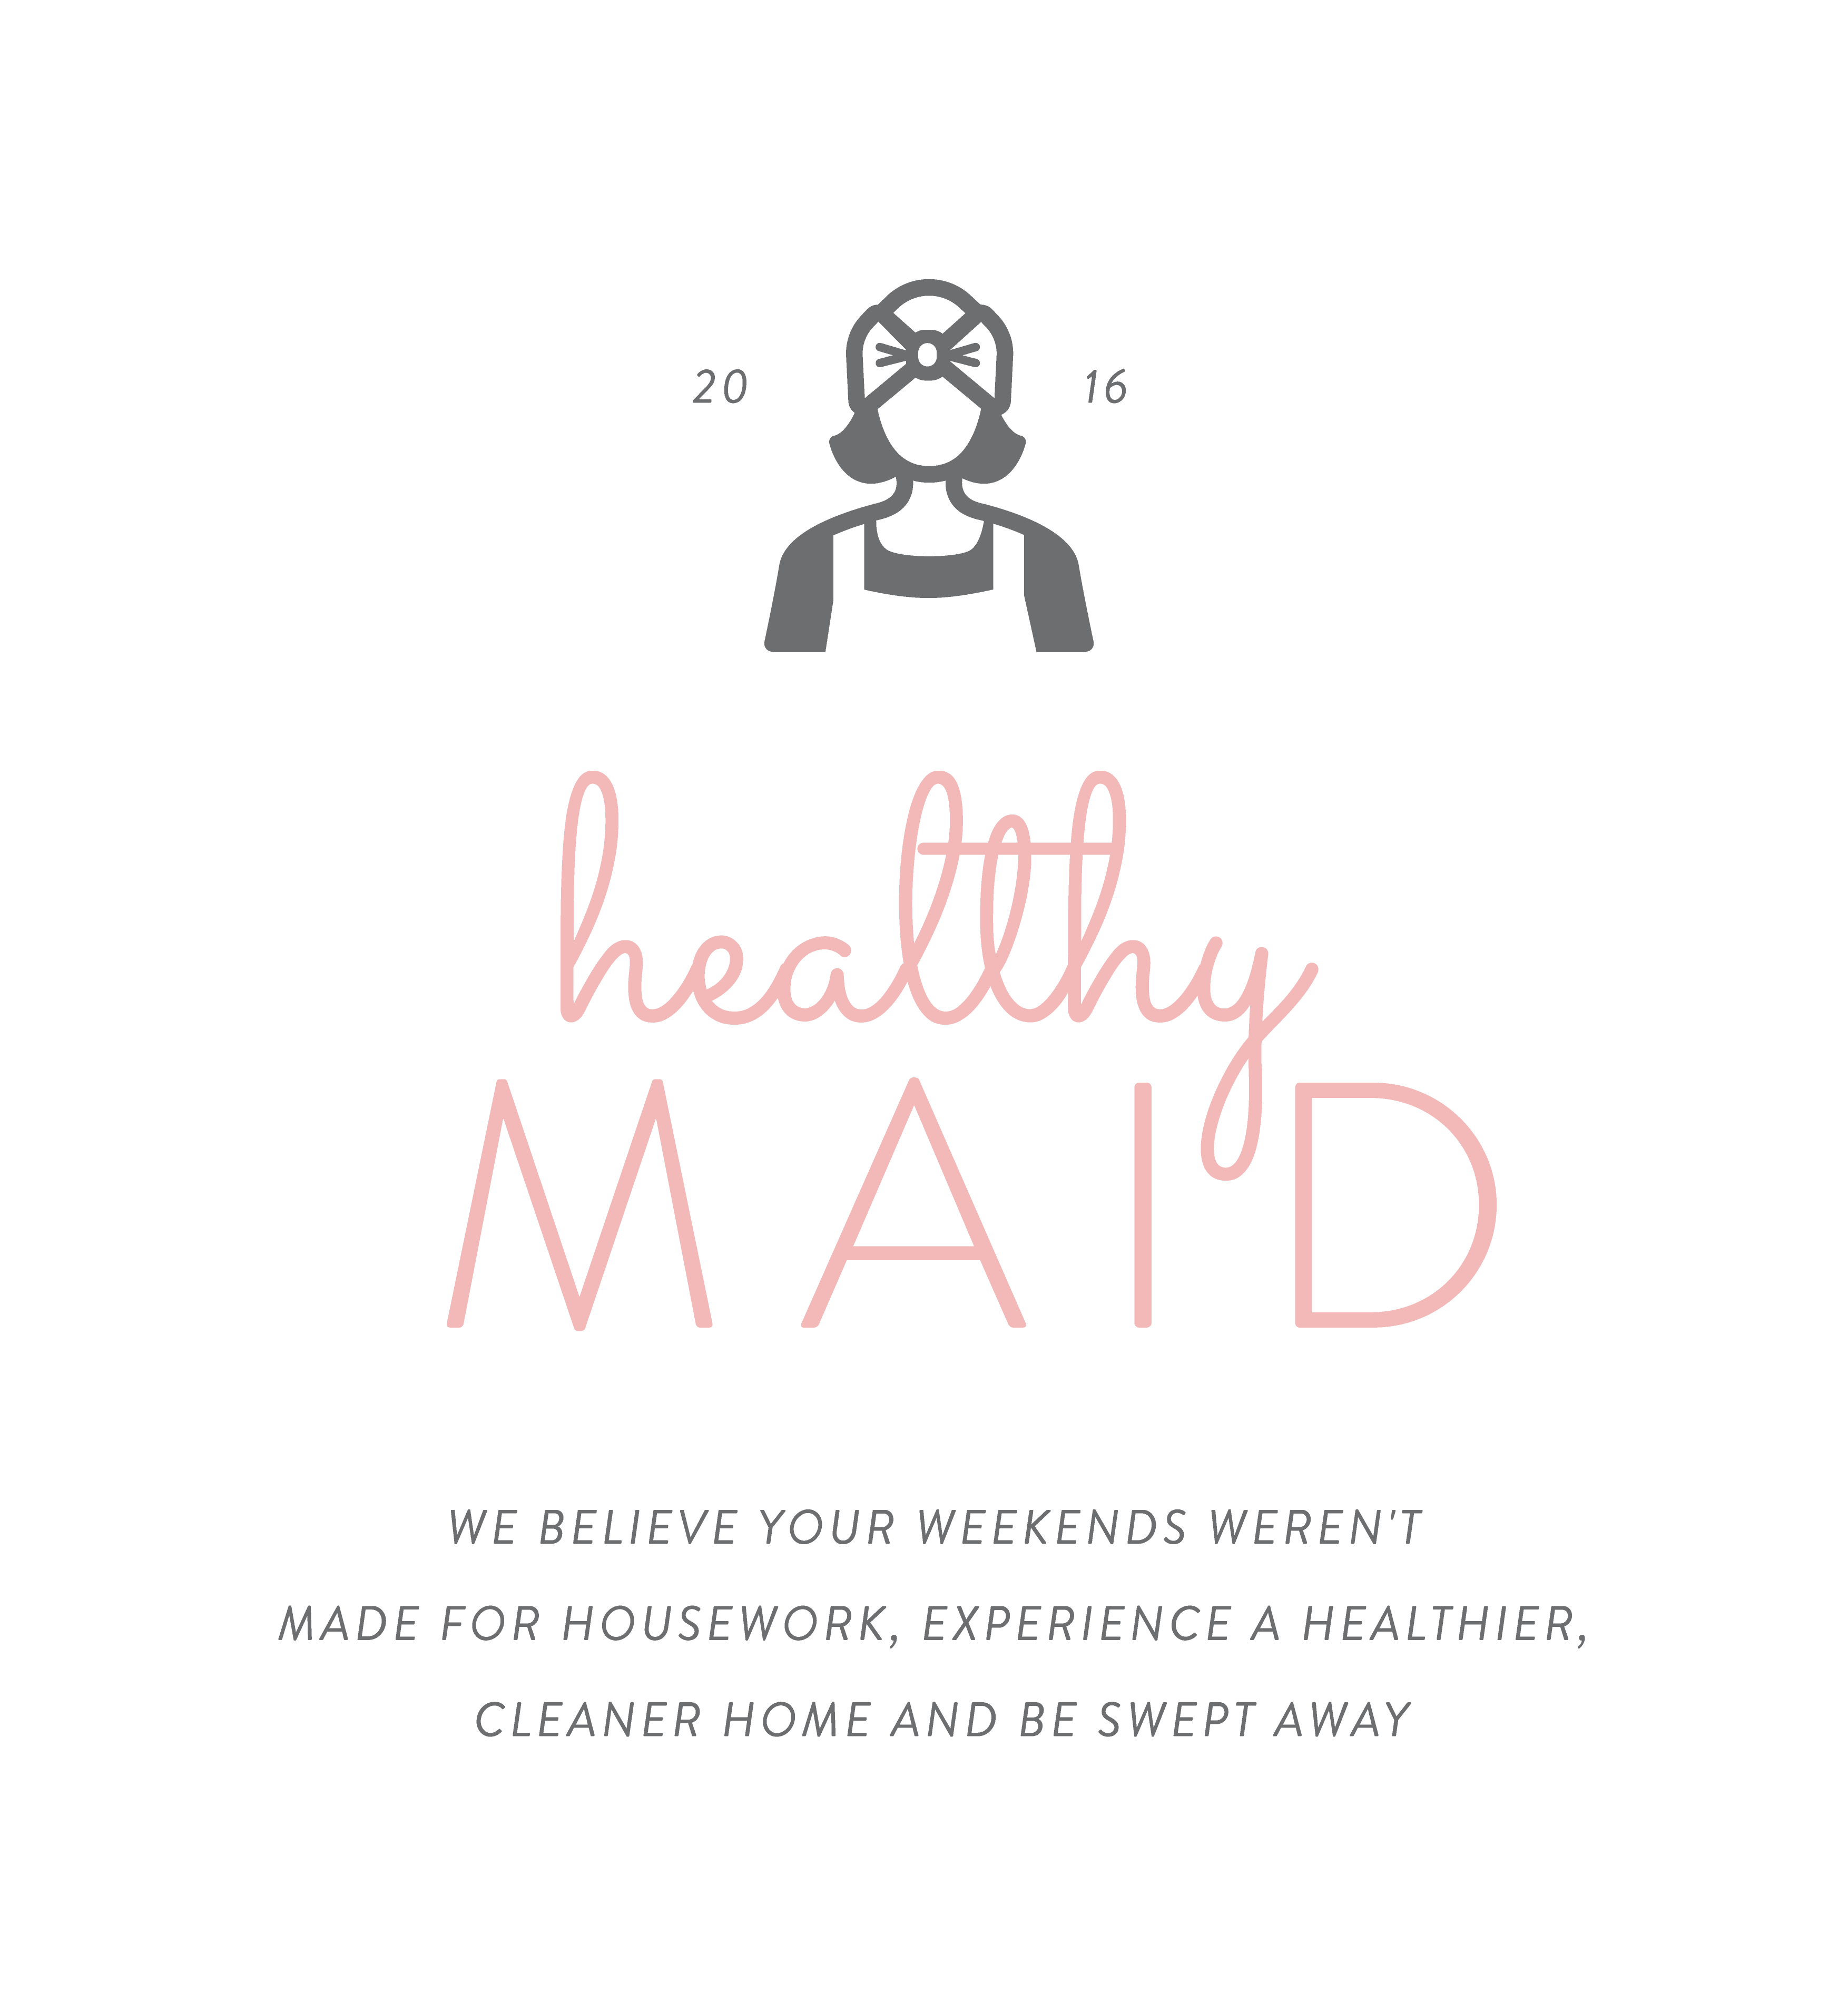 Healthy Maid